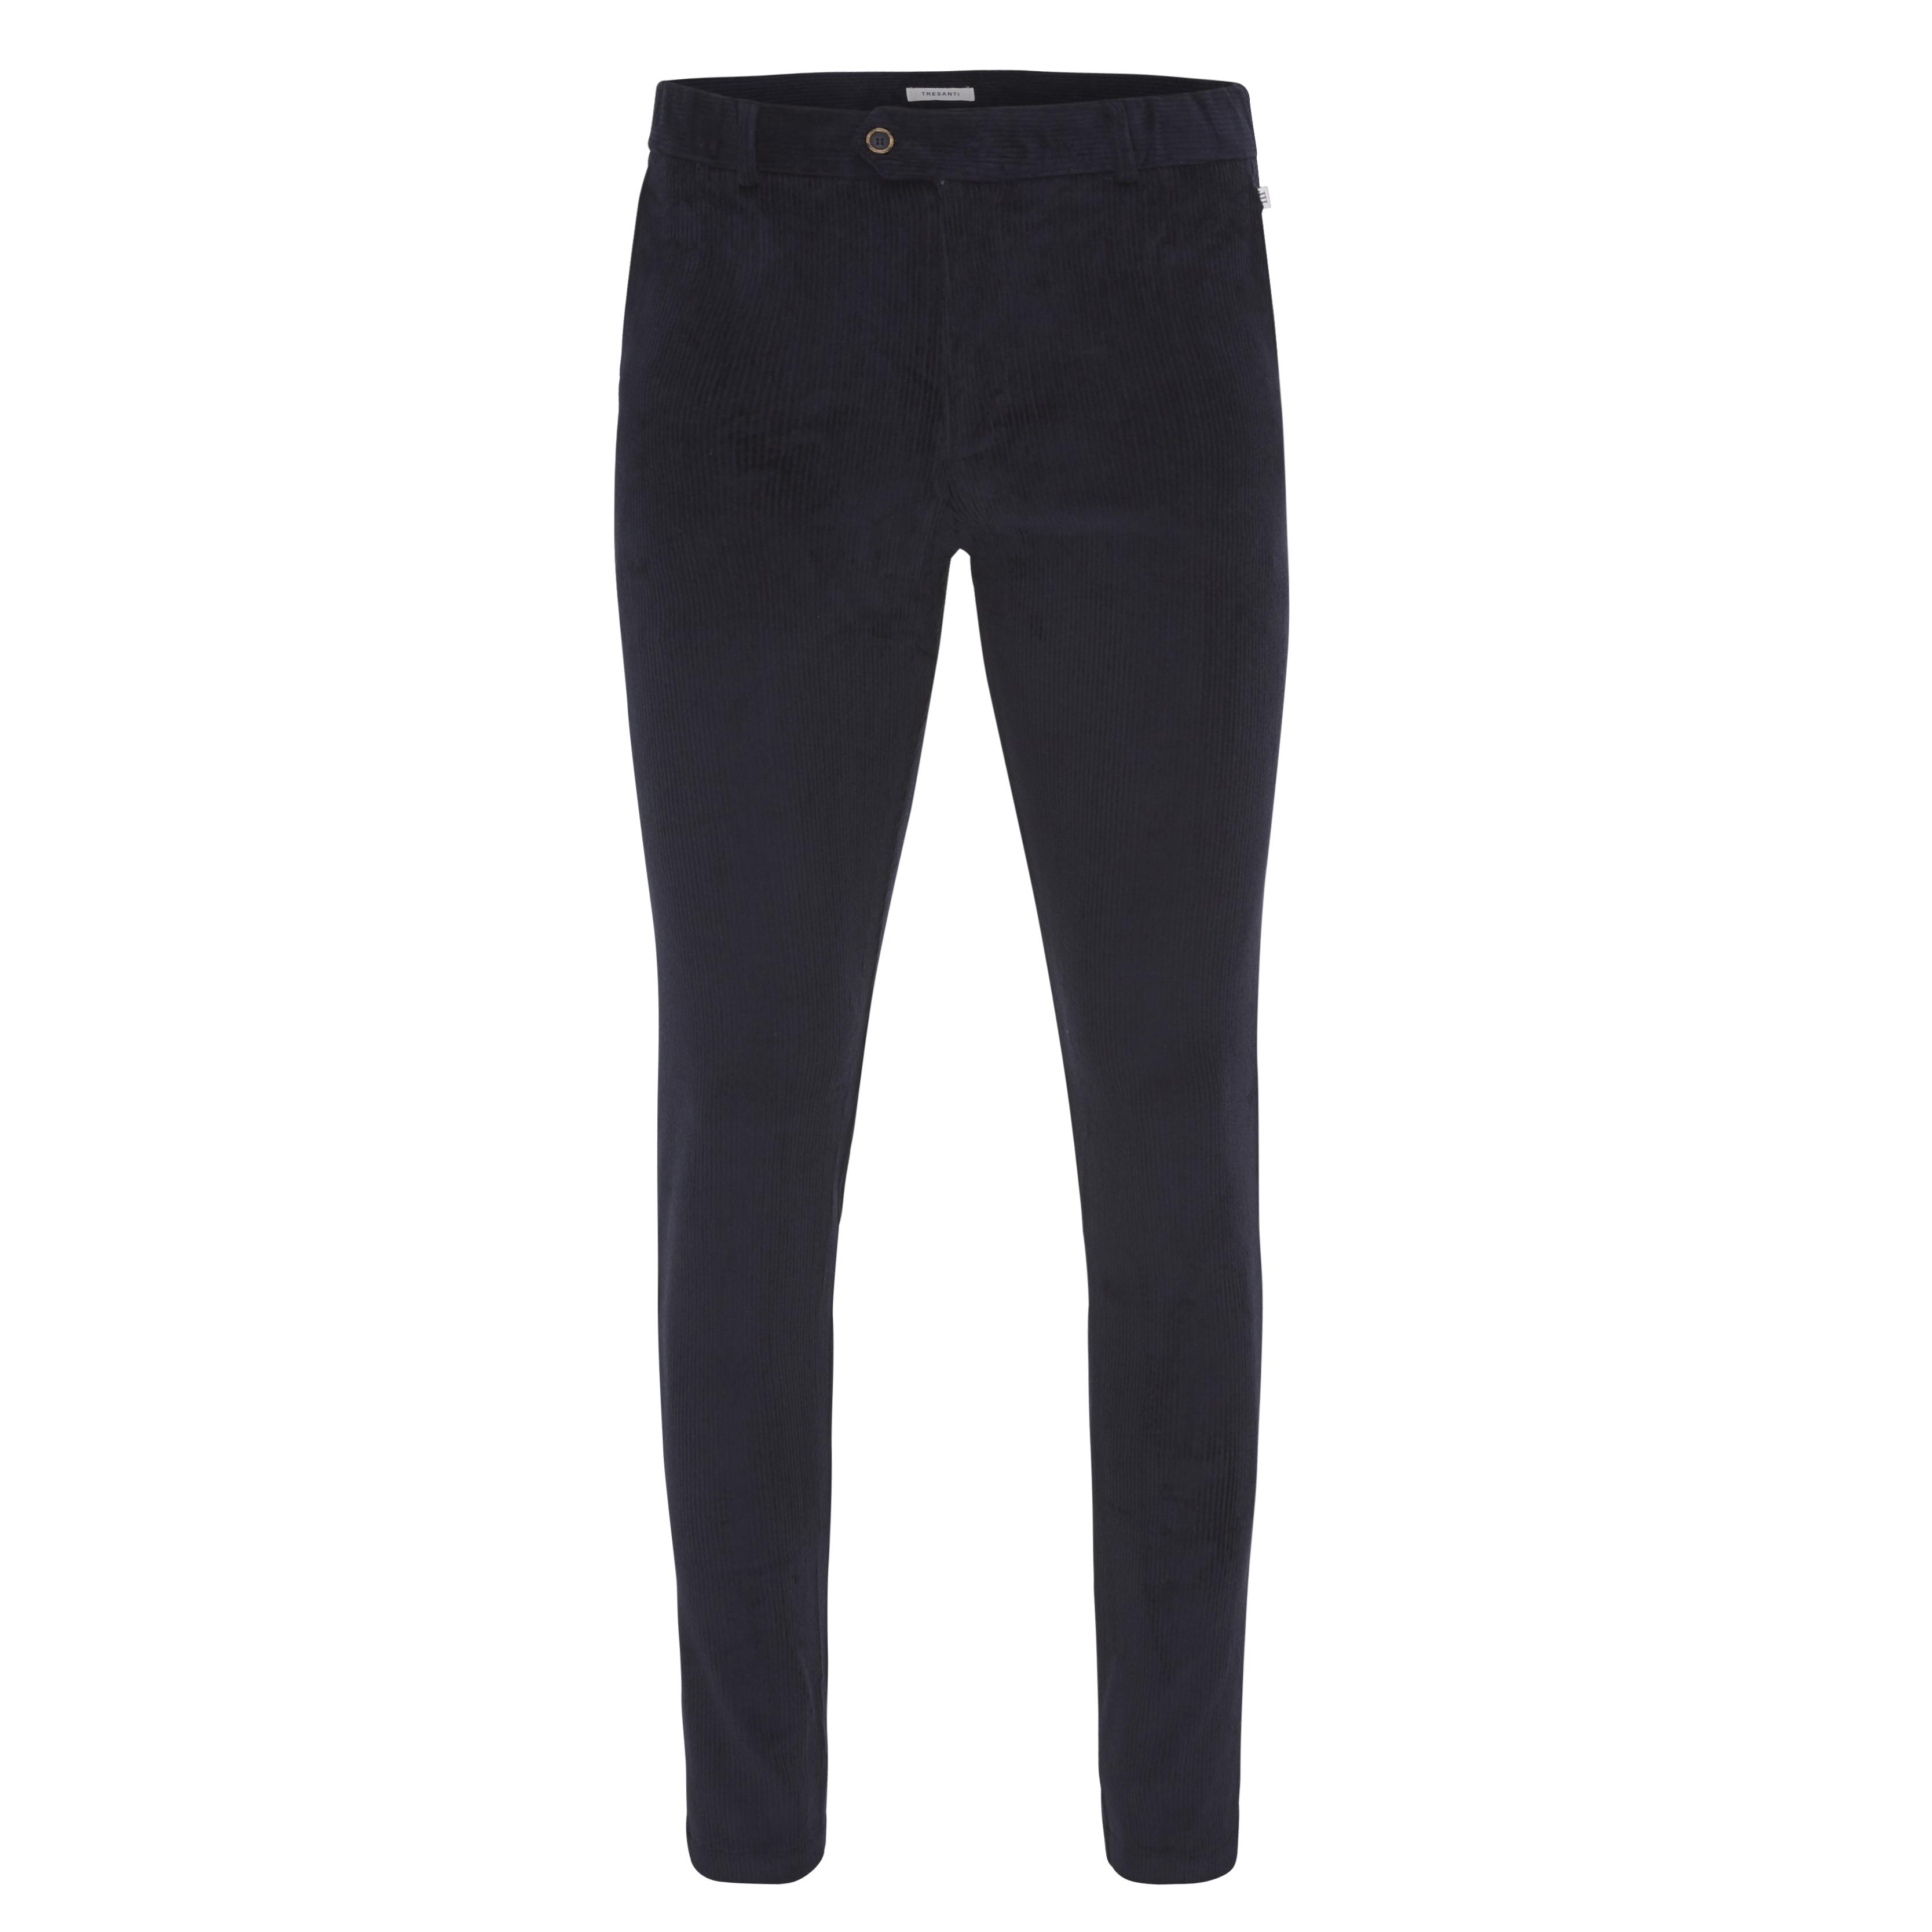 Jackson | Trousers stretch corduroy navy